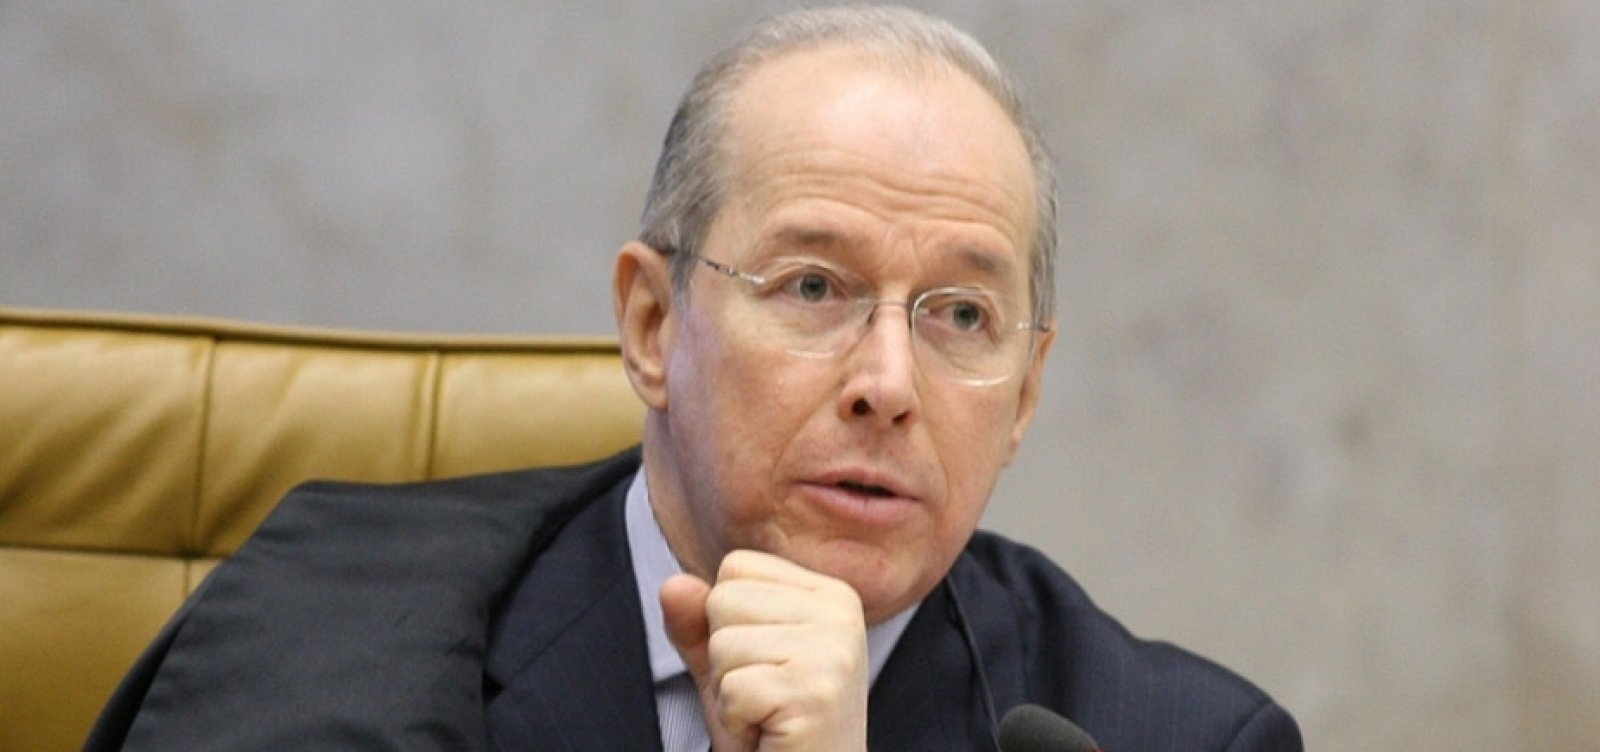 [Celso de Mello deve deferir abertura de inquérito para investigar Bolsonaro nesta segunda-feira]